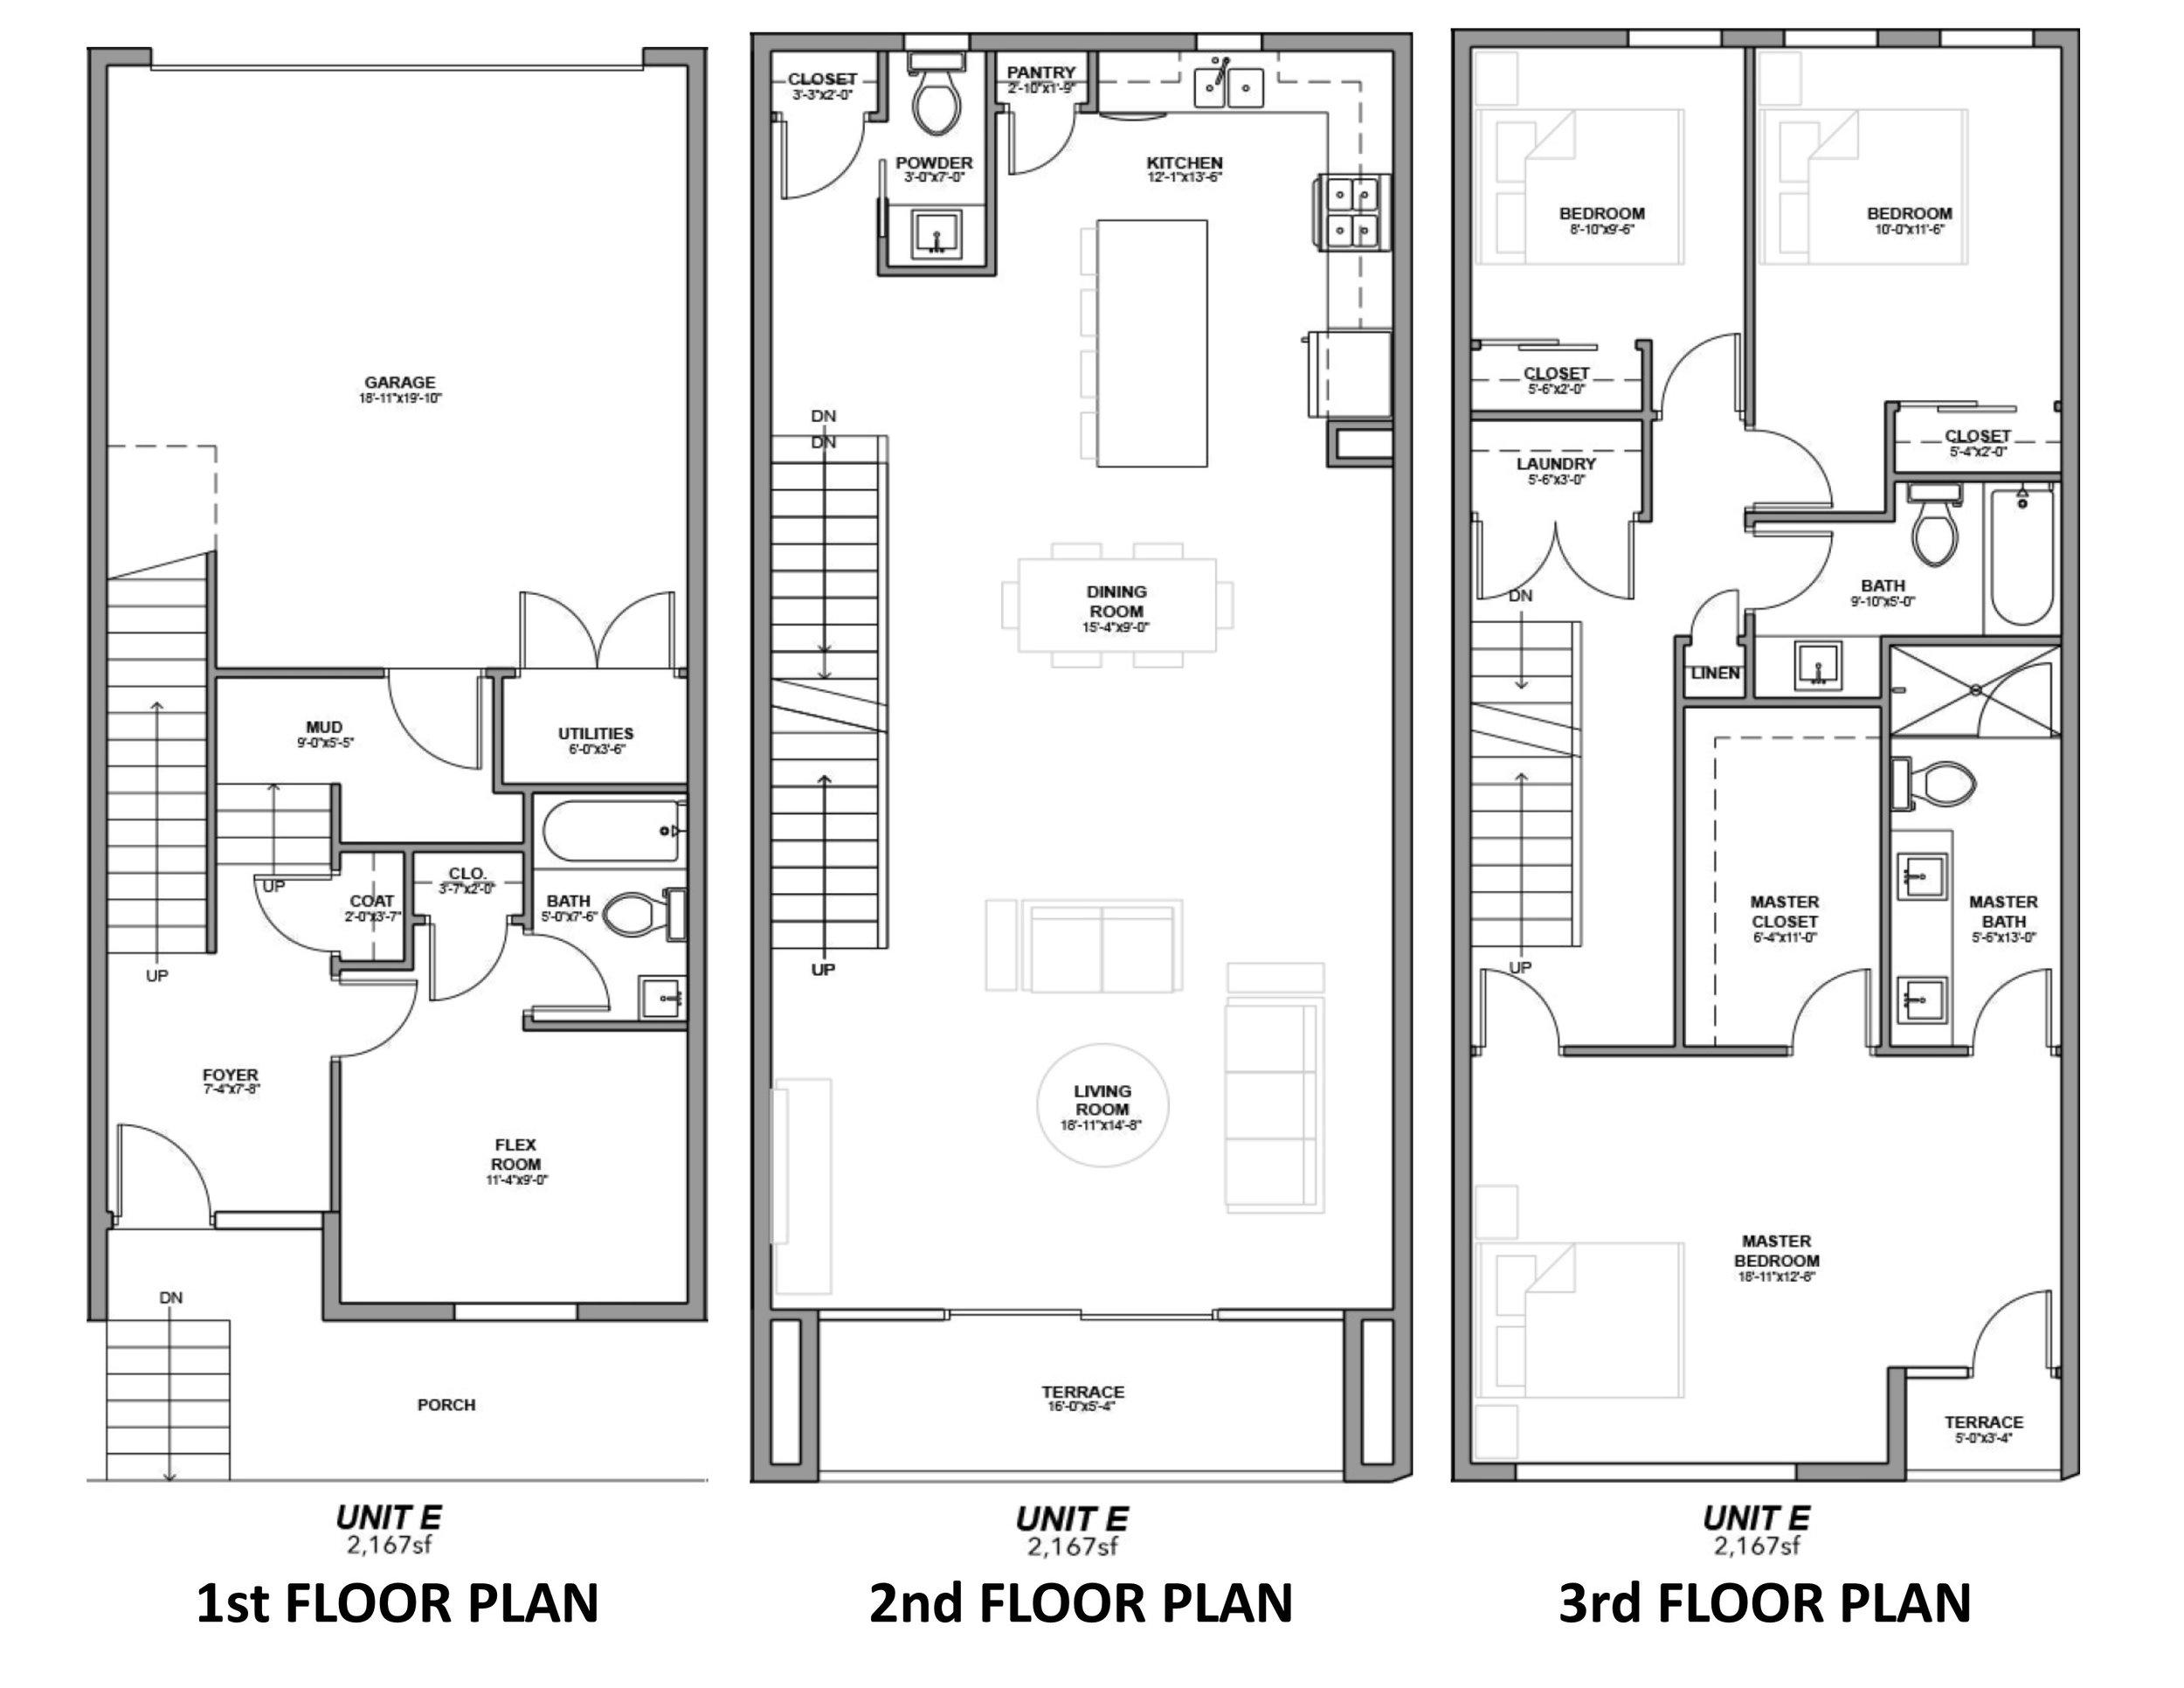 Floorplan Building 3 Unit E 404 Jefferson.jpg